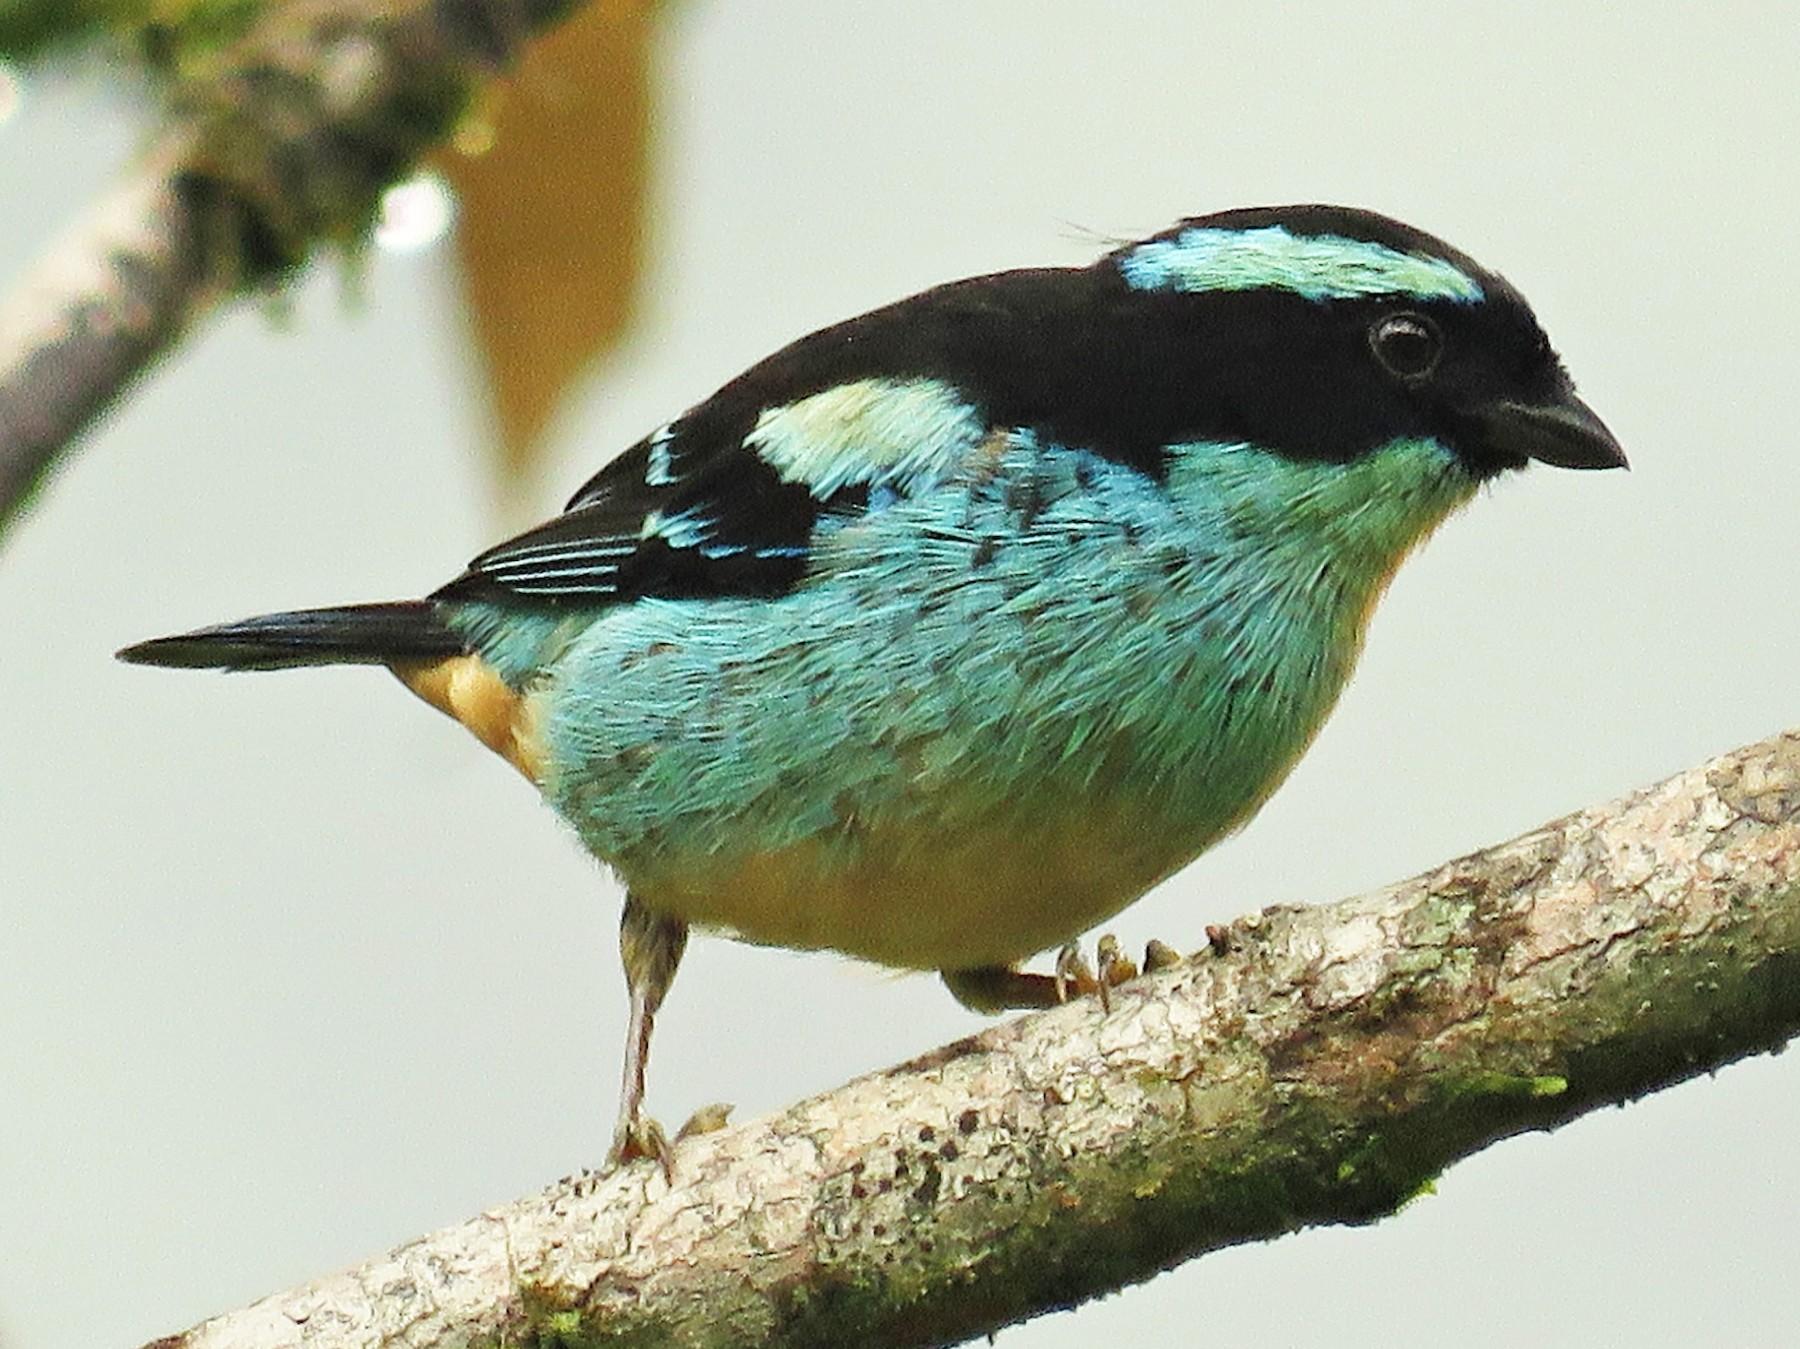 Blue-browed Tanager - Brayan Coral Jaramillo